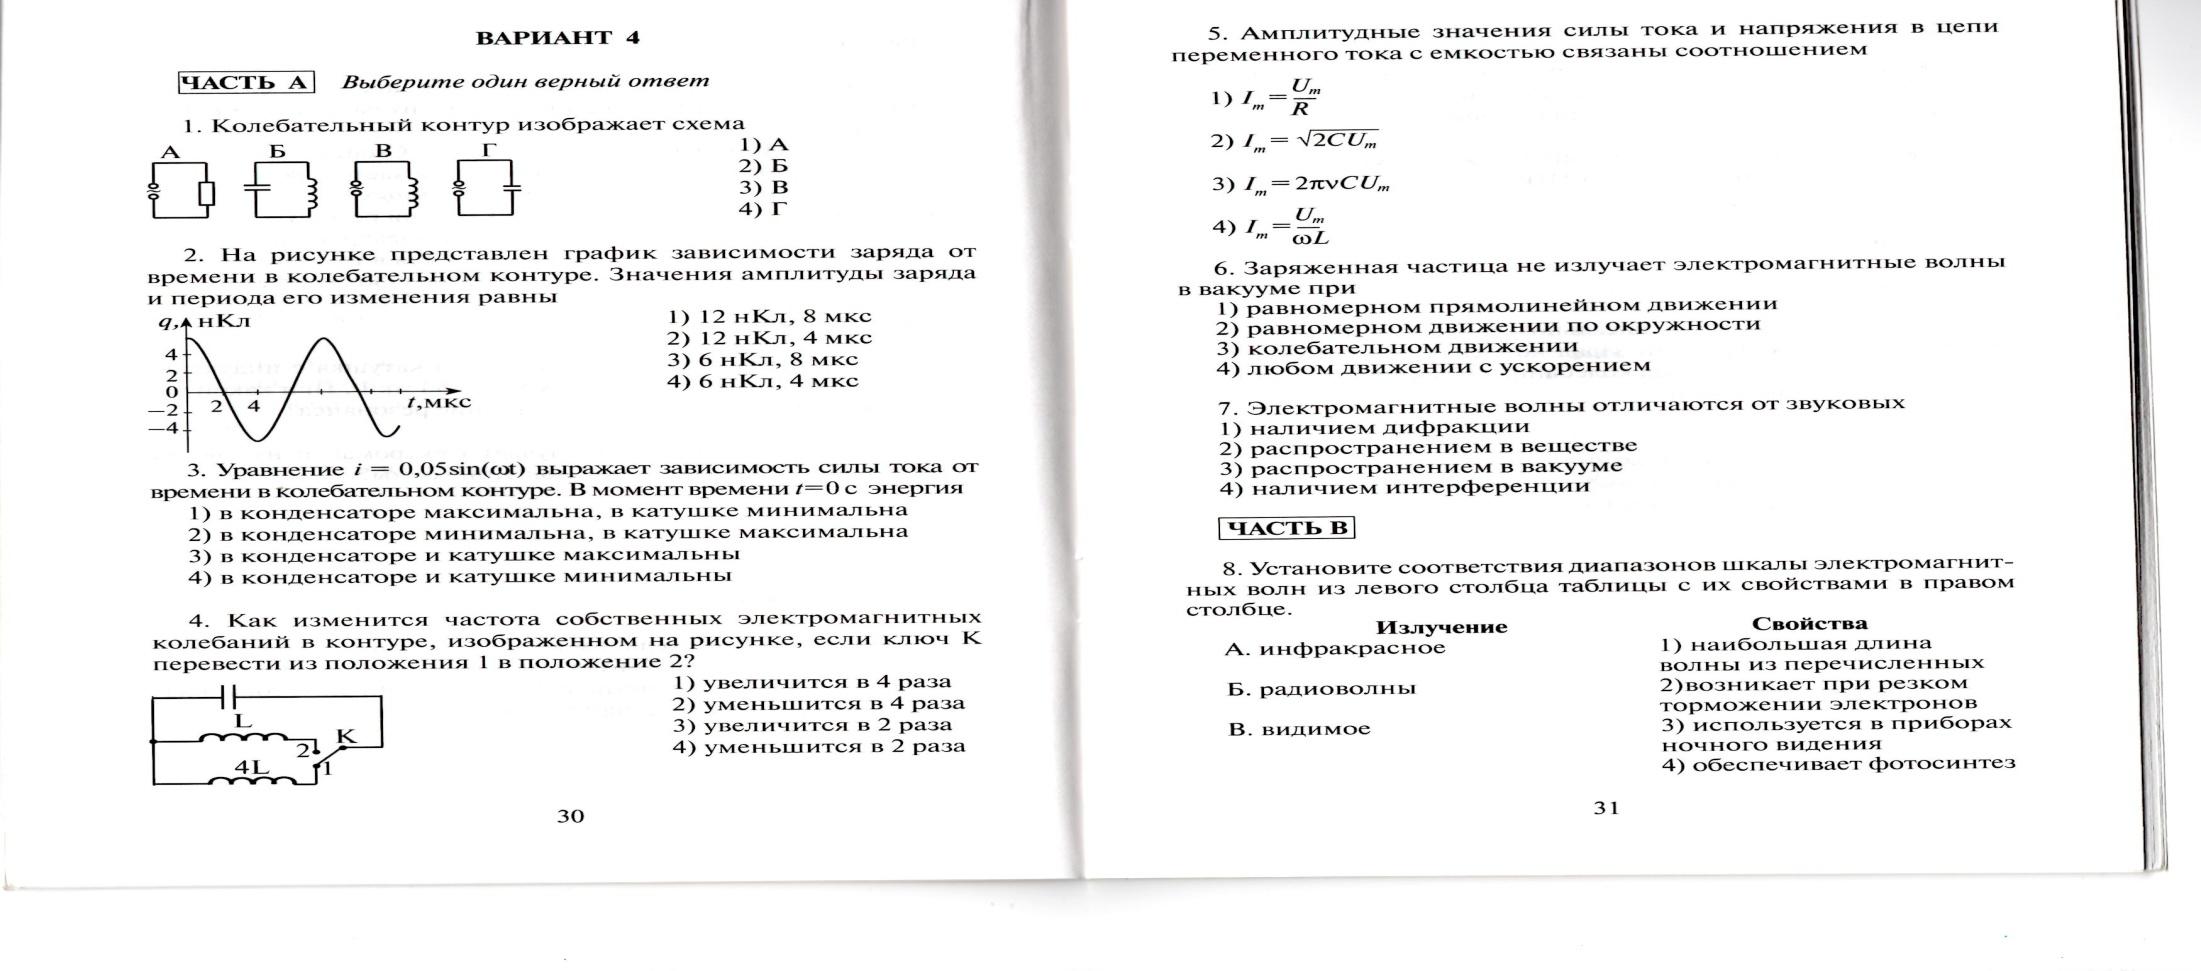 C:\Users\Svetlana\Pictures\img028.jpg